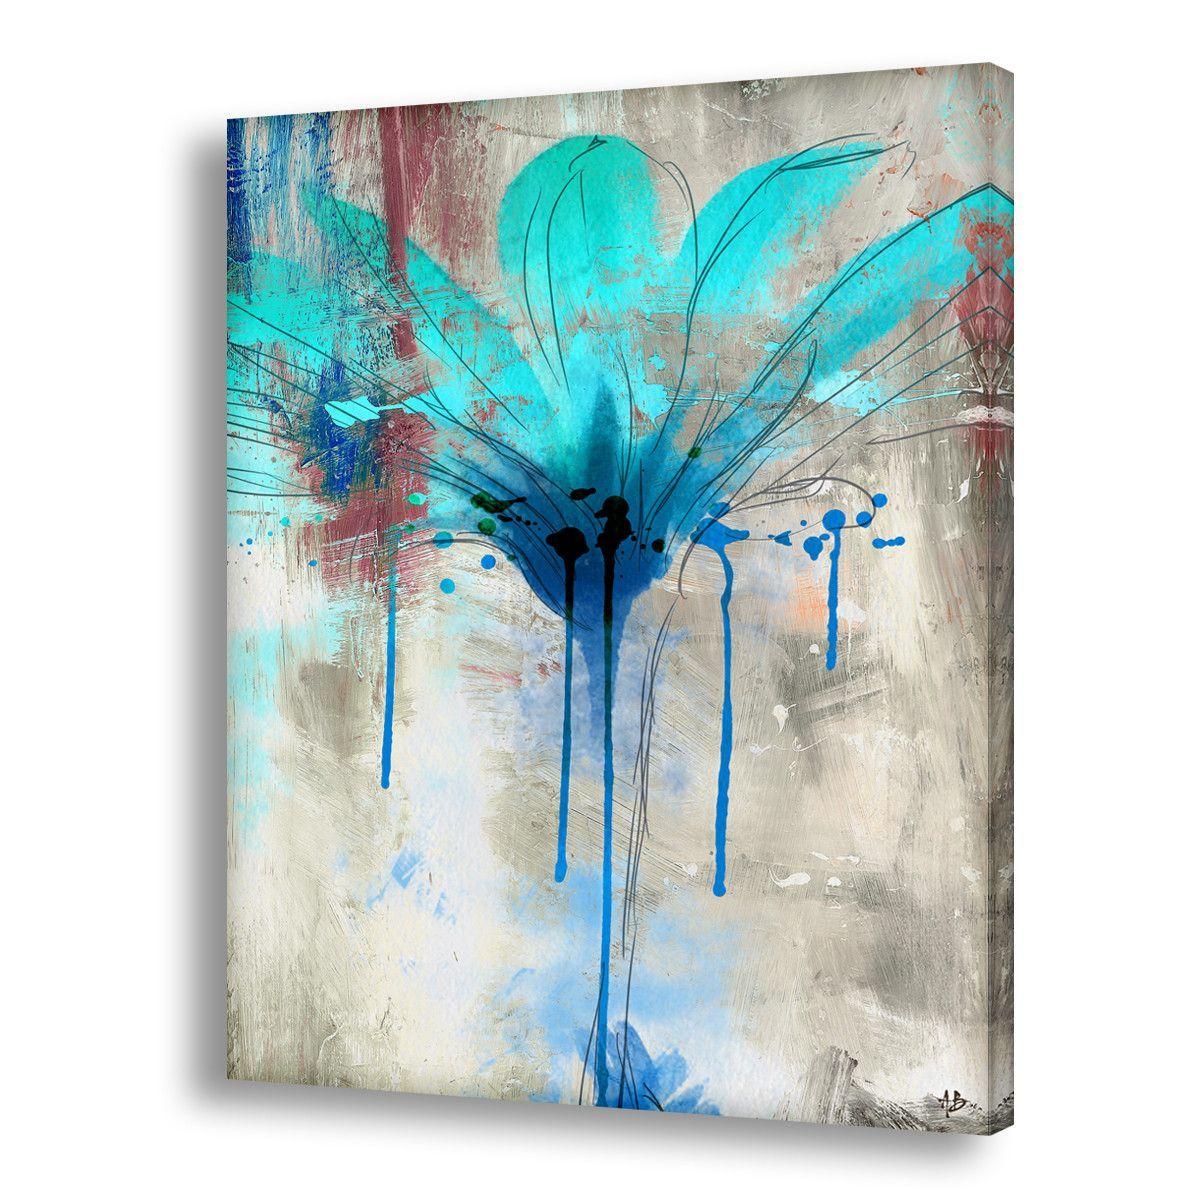 Ready2hangart U0027Painted Petals LIIu0027 Canvas Wall Art